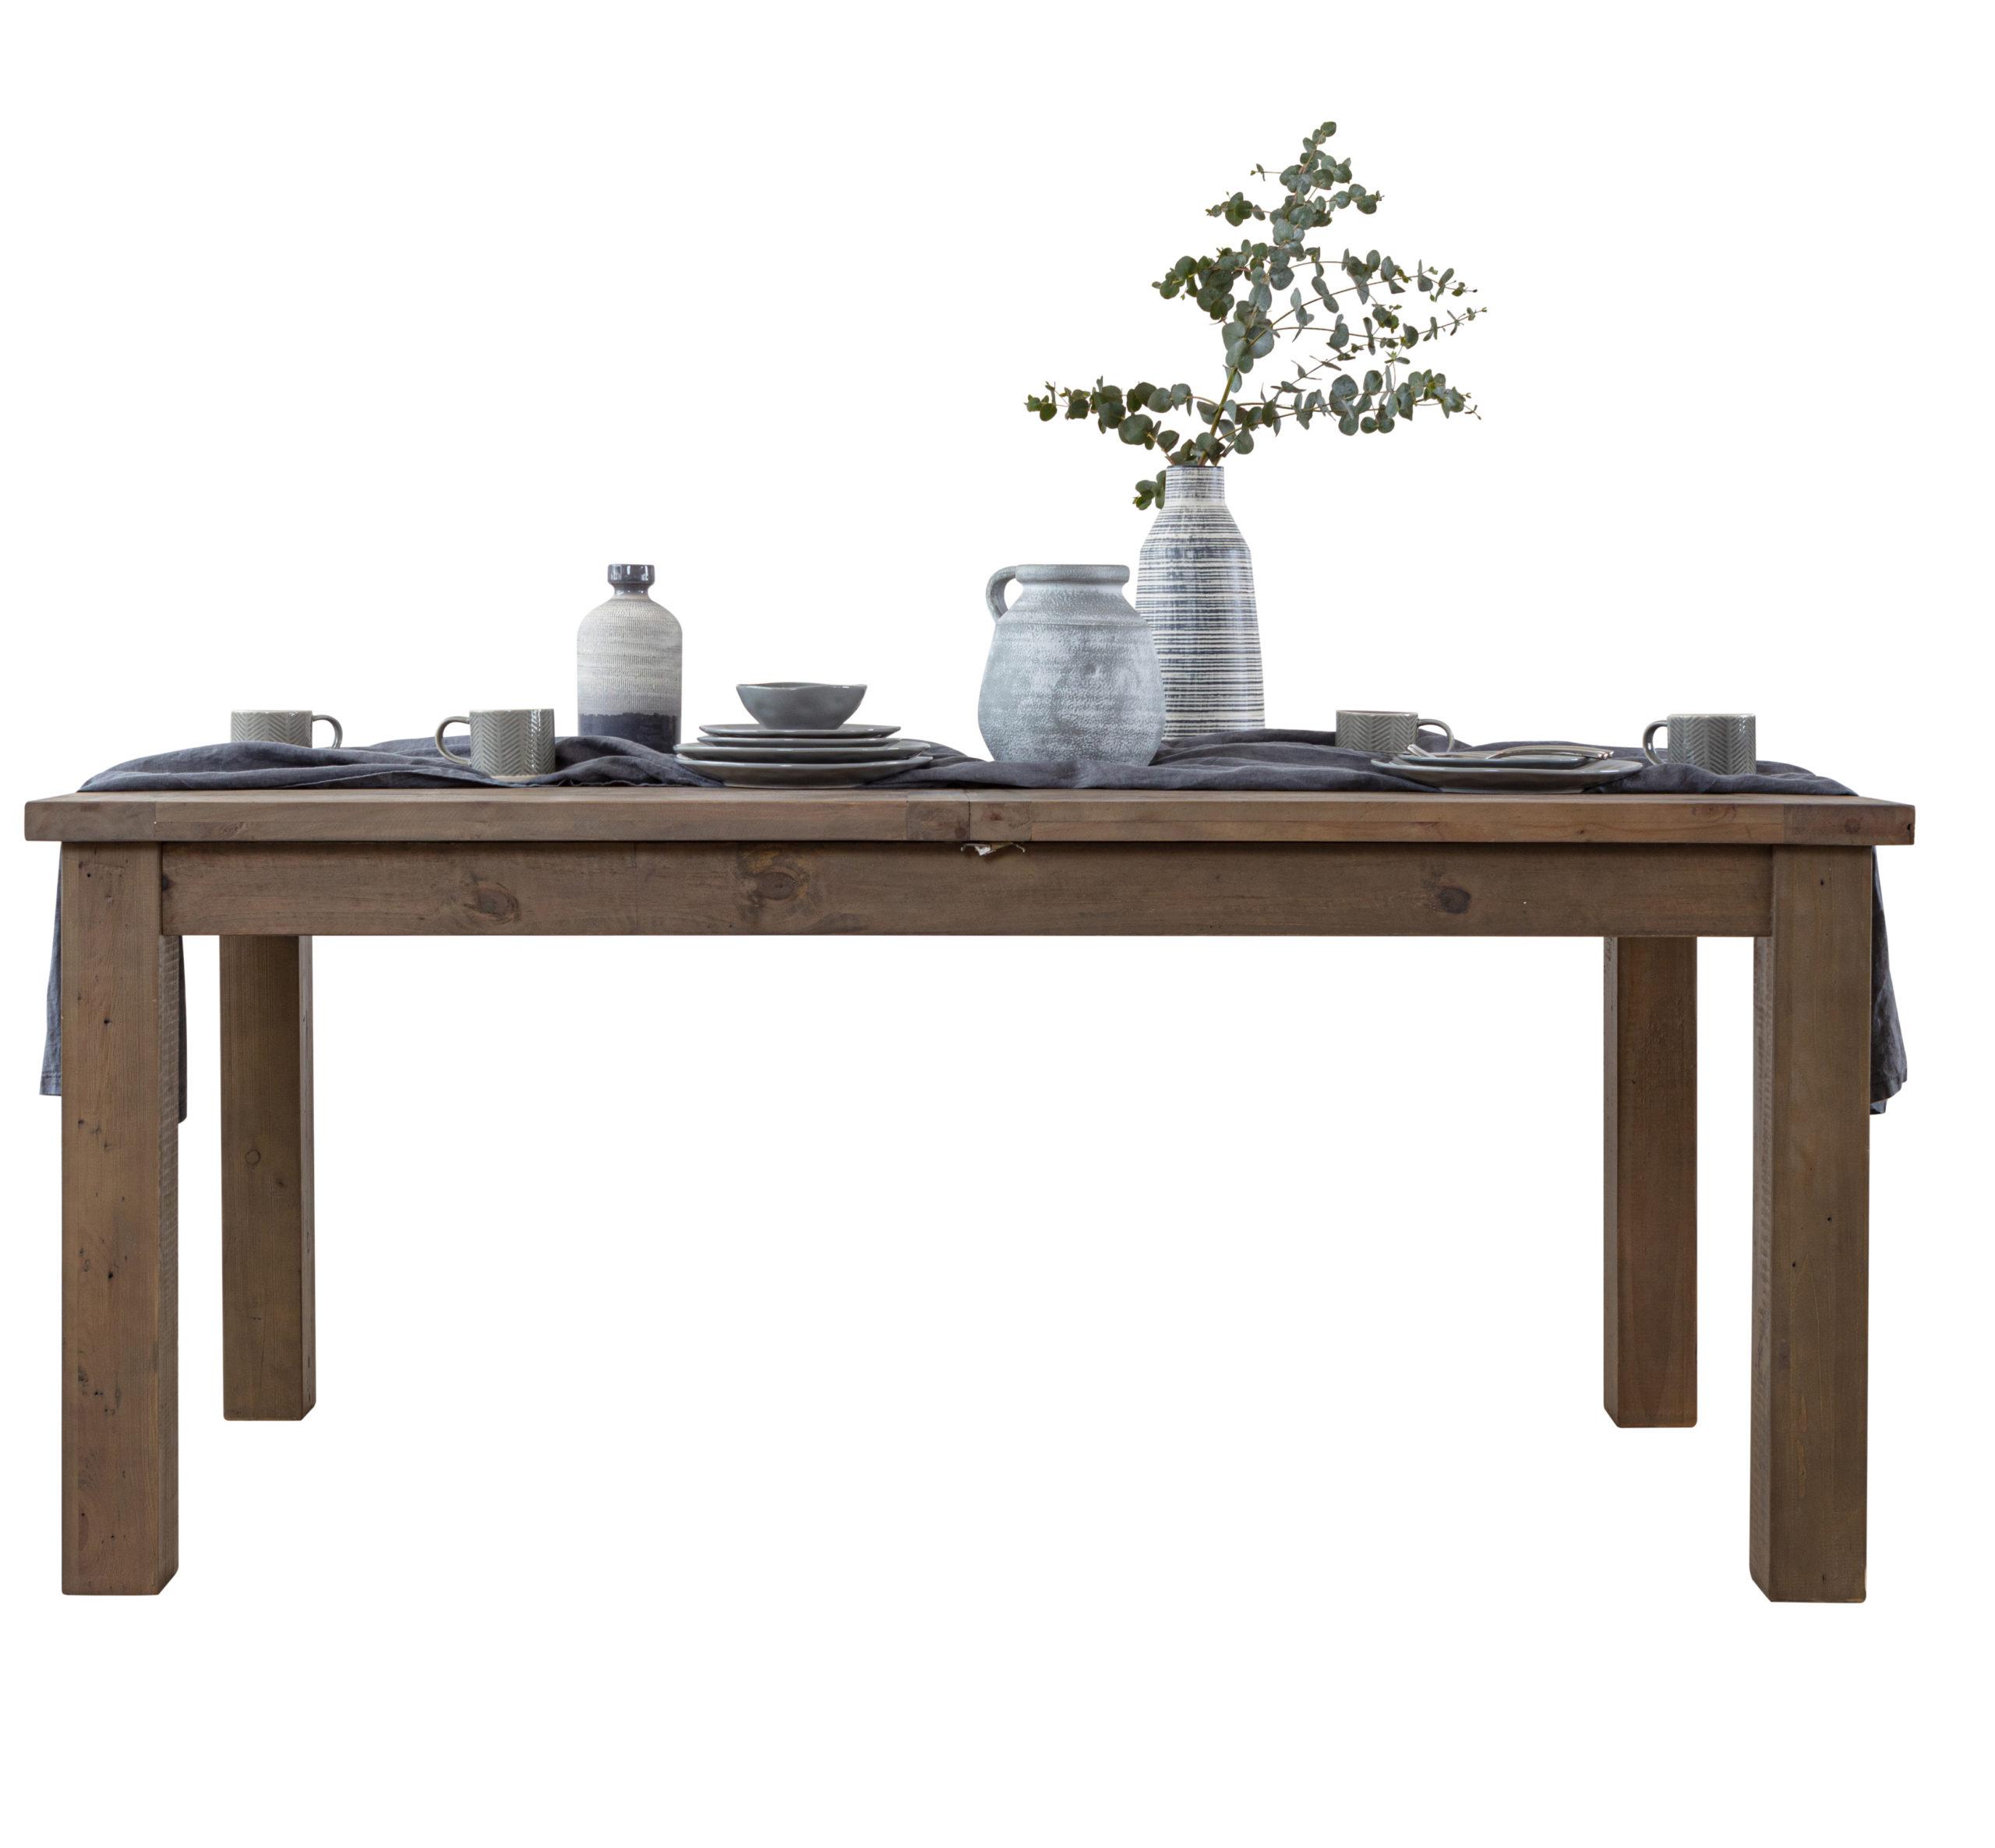 Dining table, £449, Modish Living